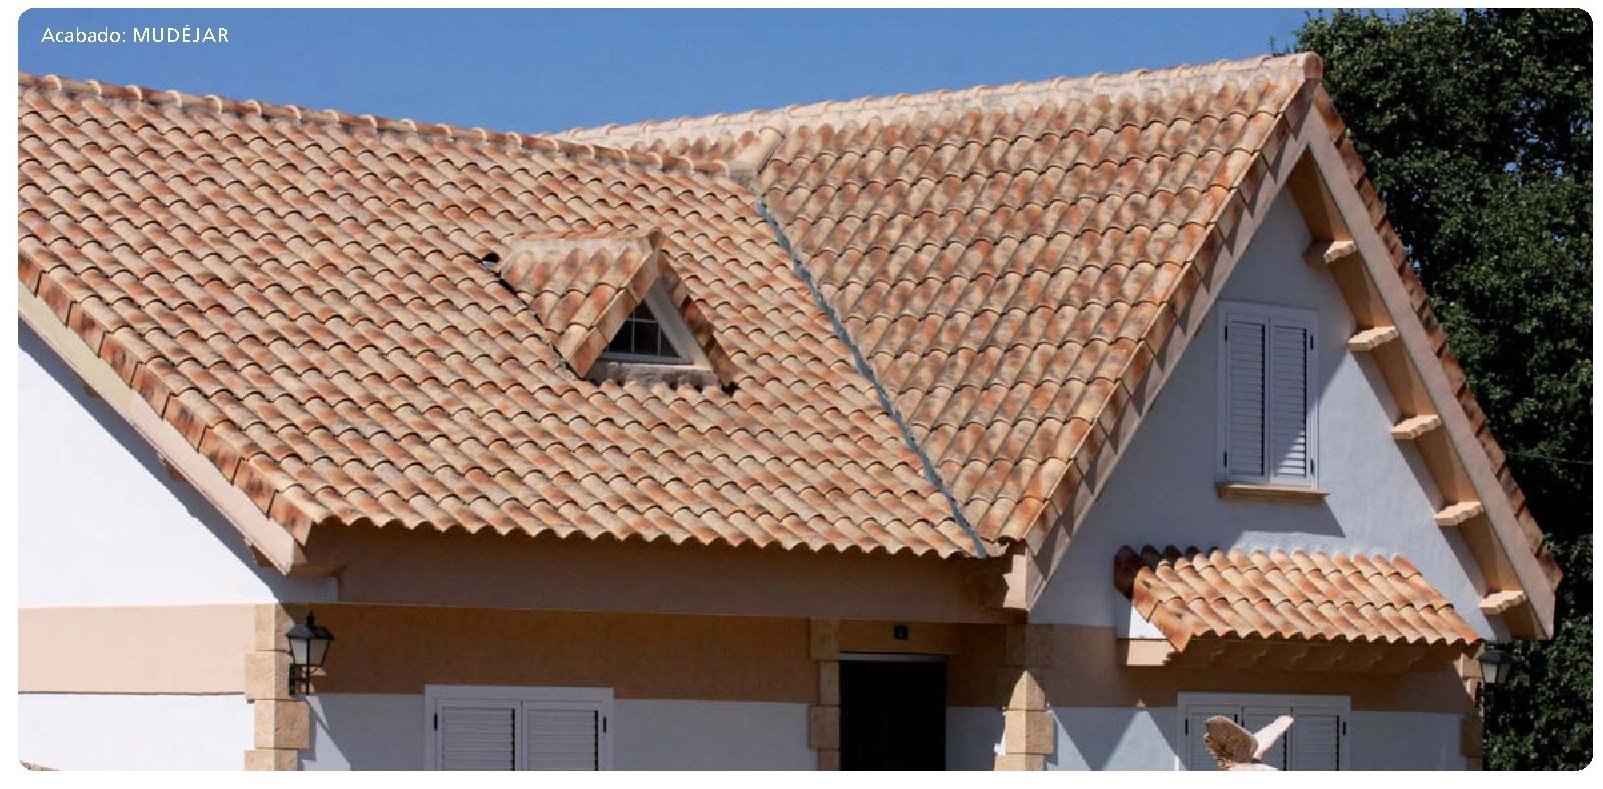 Teja cer mica collado 10 cemat gijon asturias - Dibujos de tejados ...